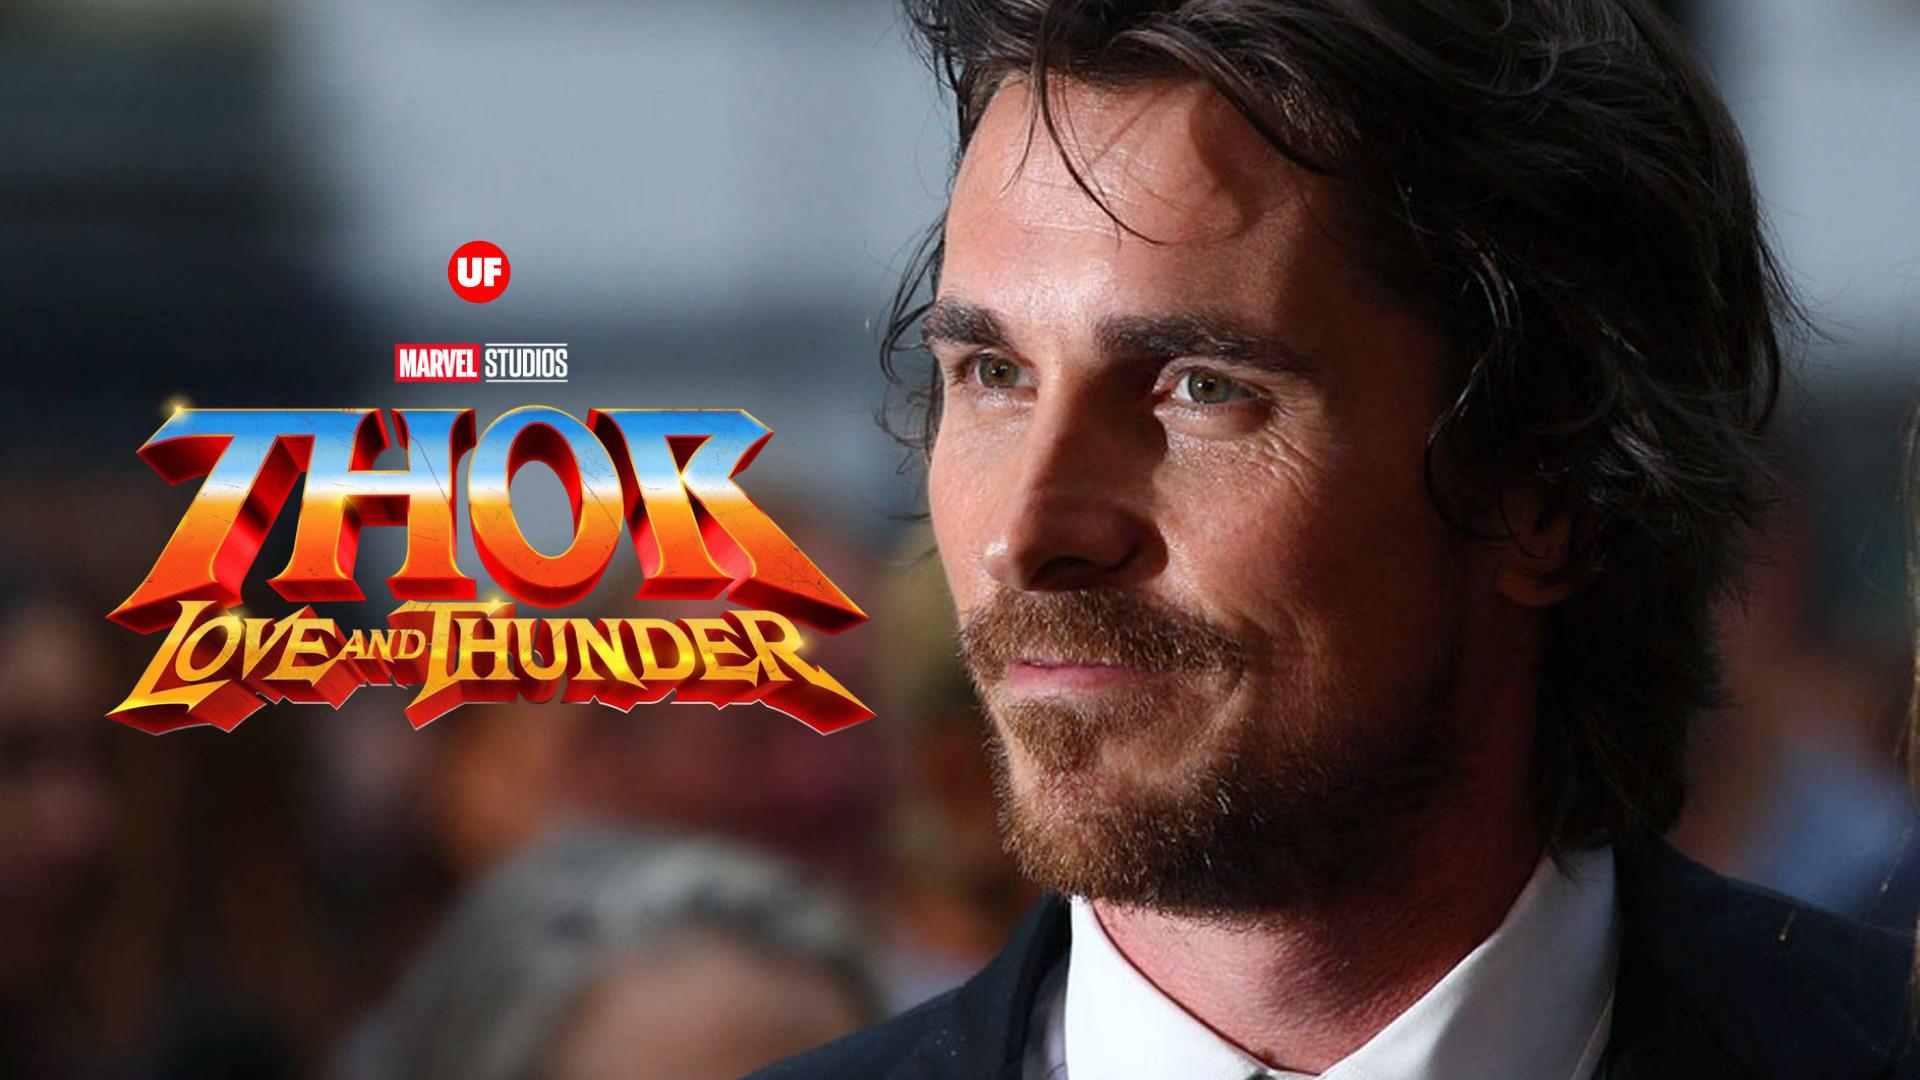 Christian Bale Arrives In Australia To Film Thor Love And Thunder Christian Bale Thor Film